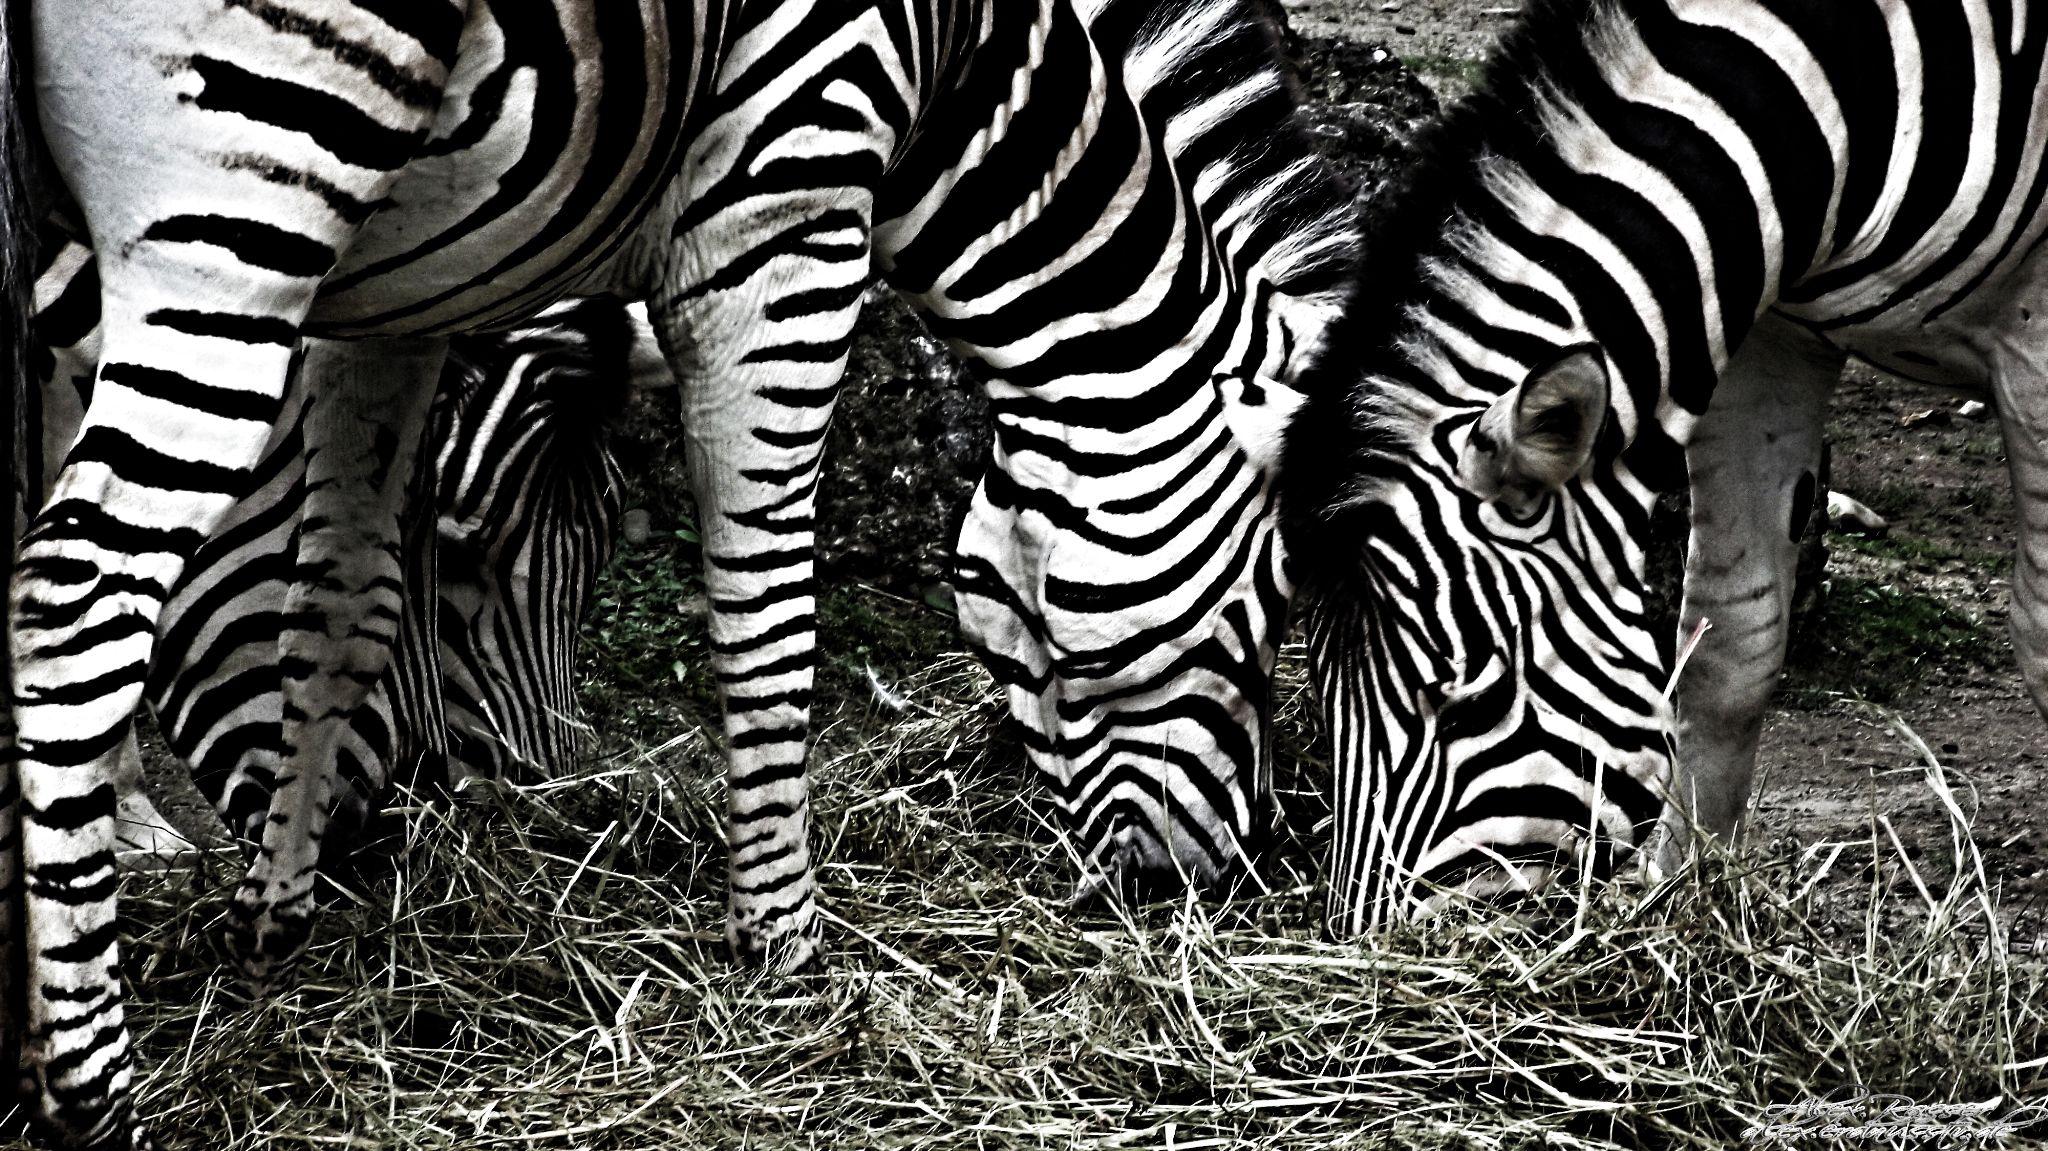 Zebra by alexrasser